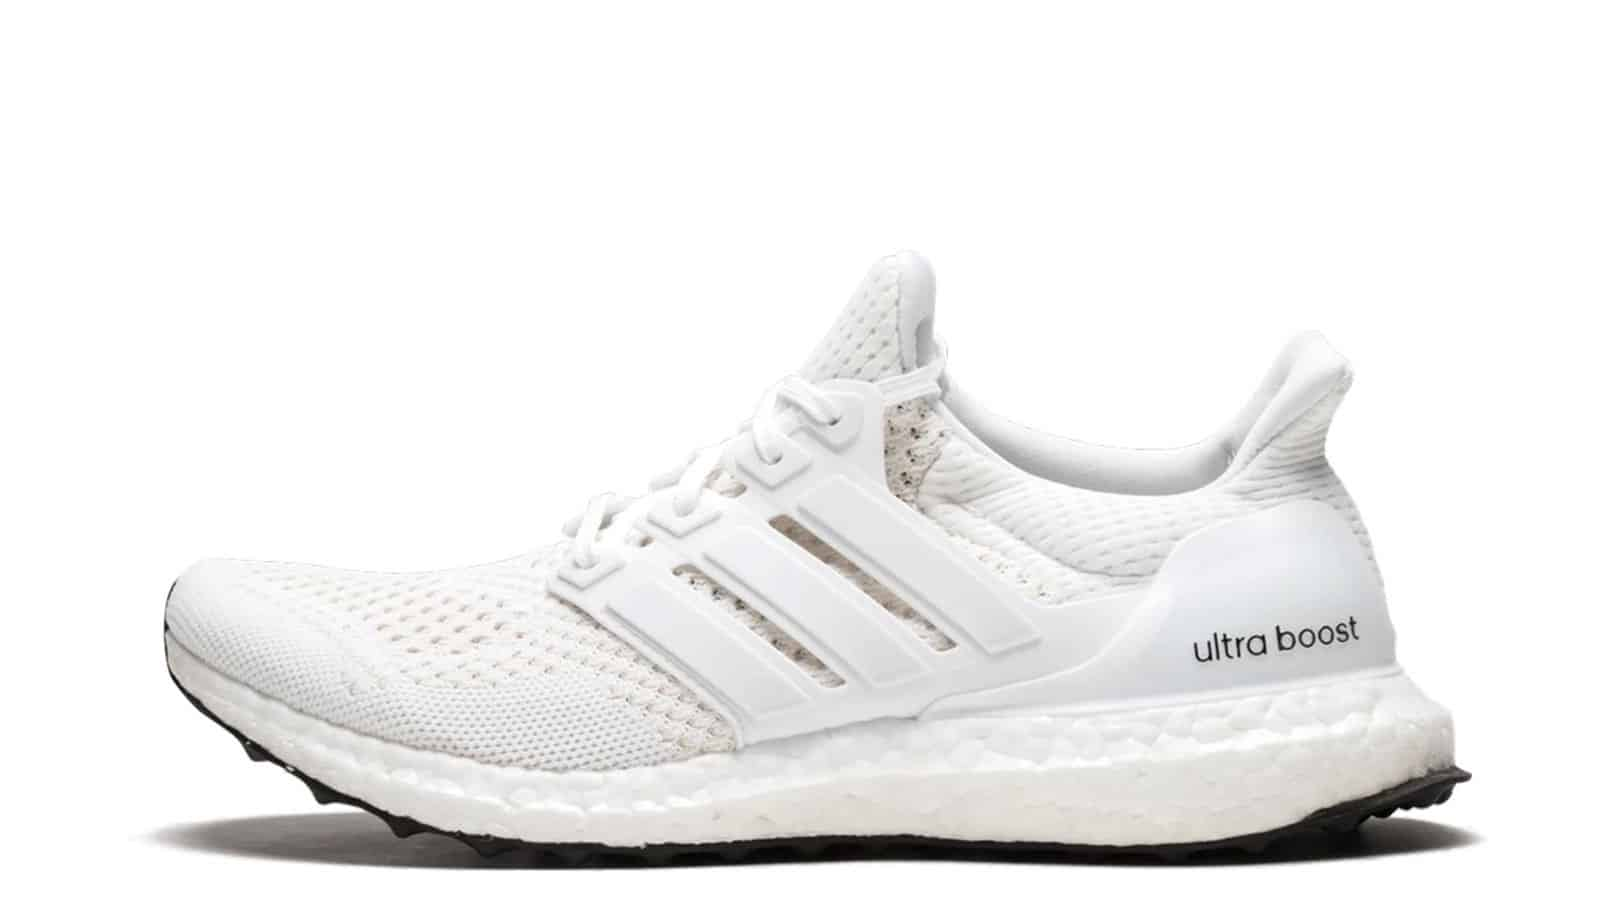 Adidas Ultra Boost 1.0 Triple White S77416